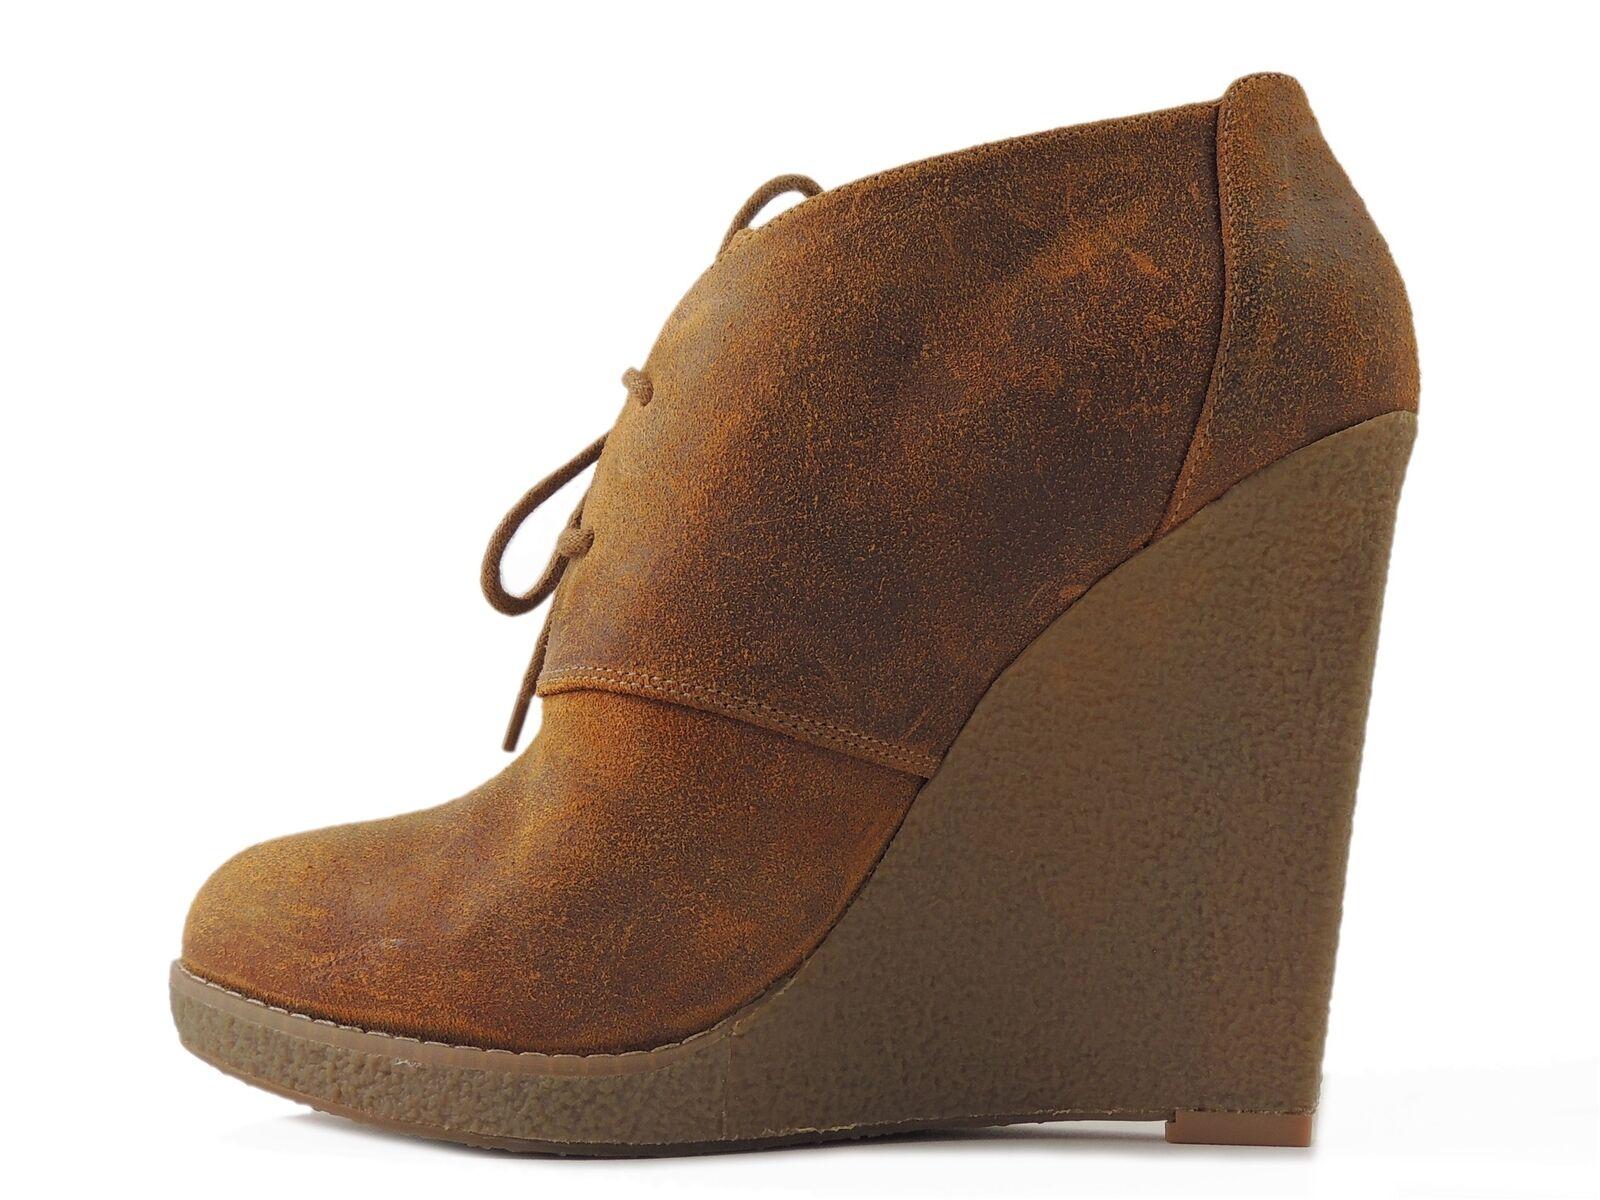 e0ce7ba8e880 ENZO Angiolini Shoes 10 M Womens Flory Medium Natural Leather Ankle ...